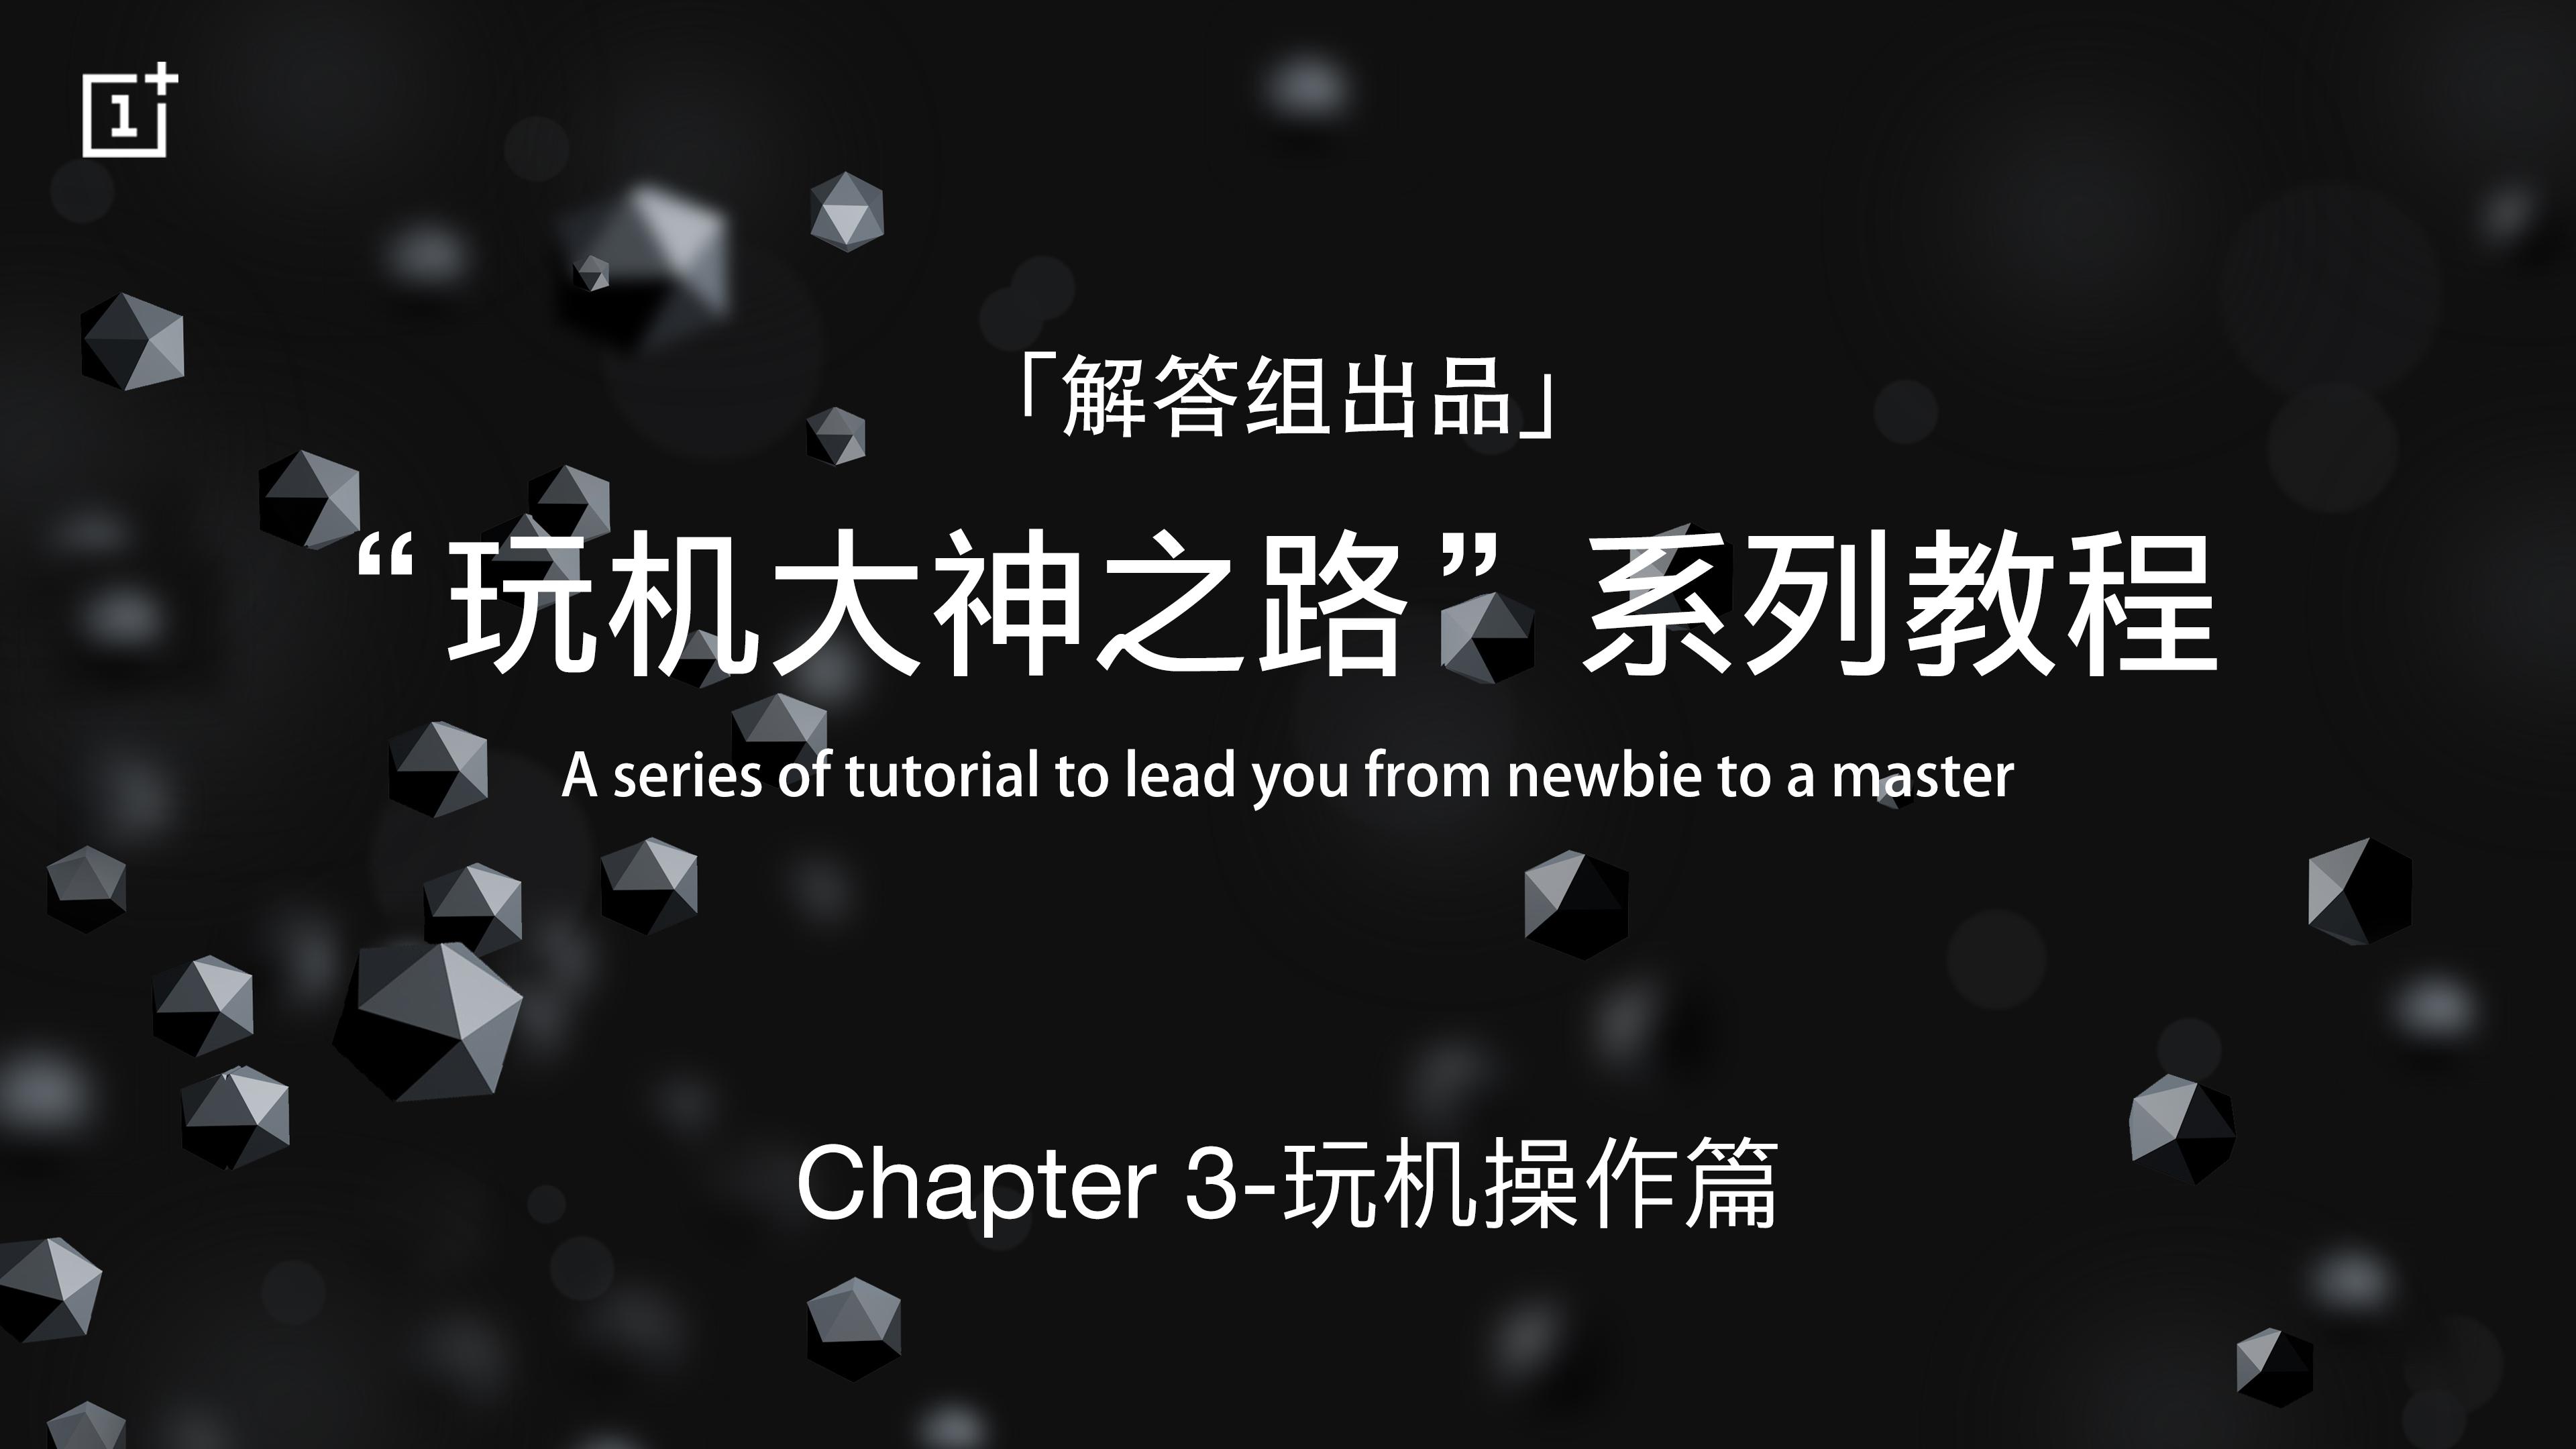 第三章.png